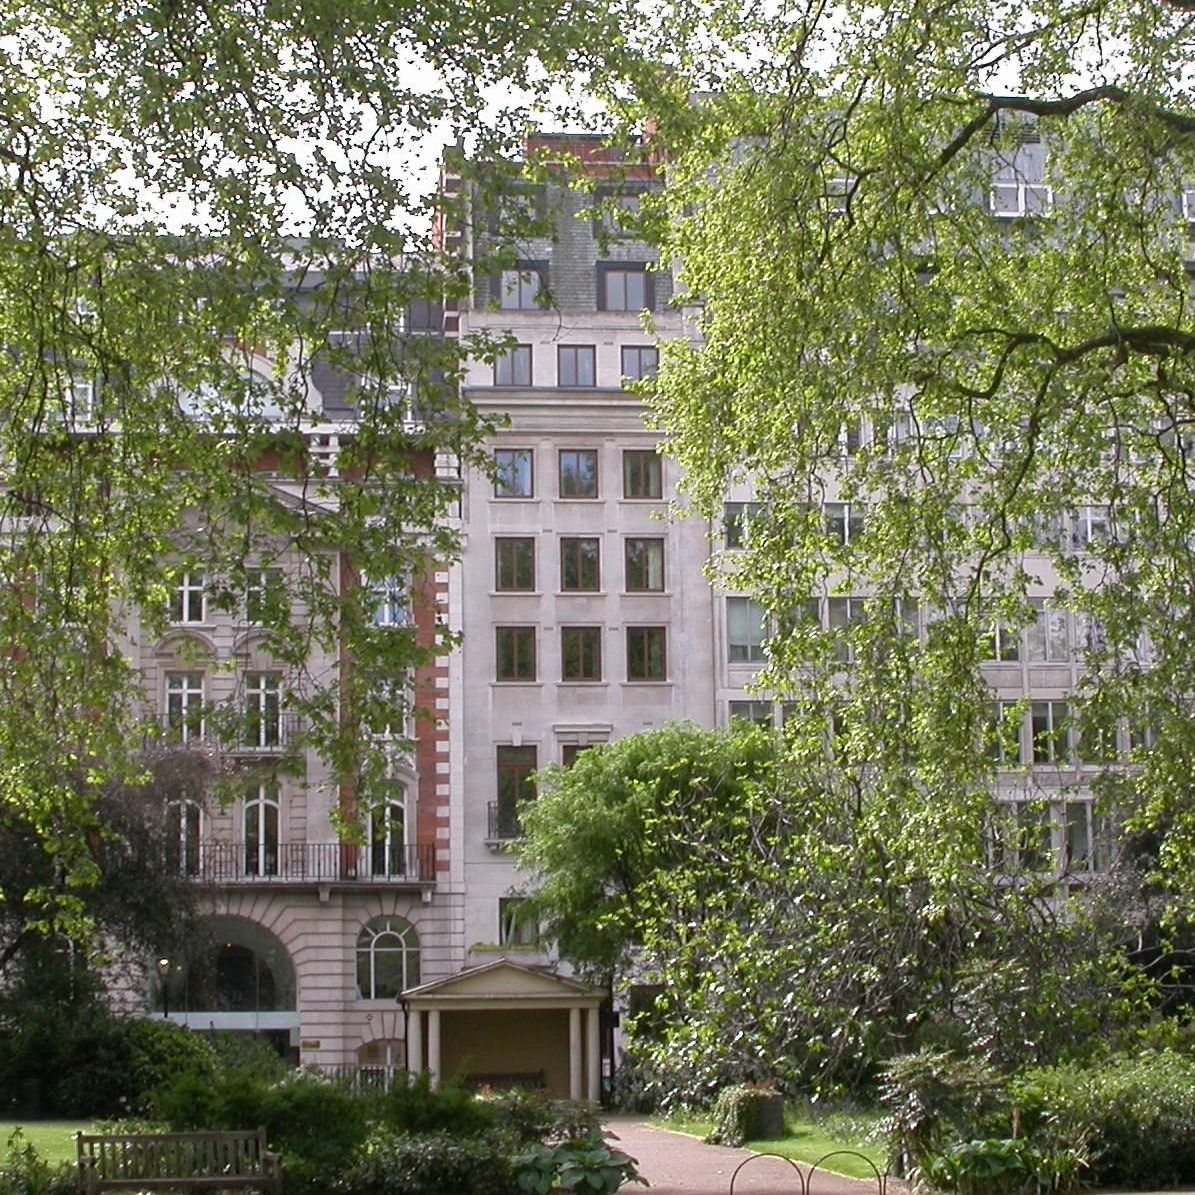 St James's Square Penthouse